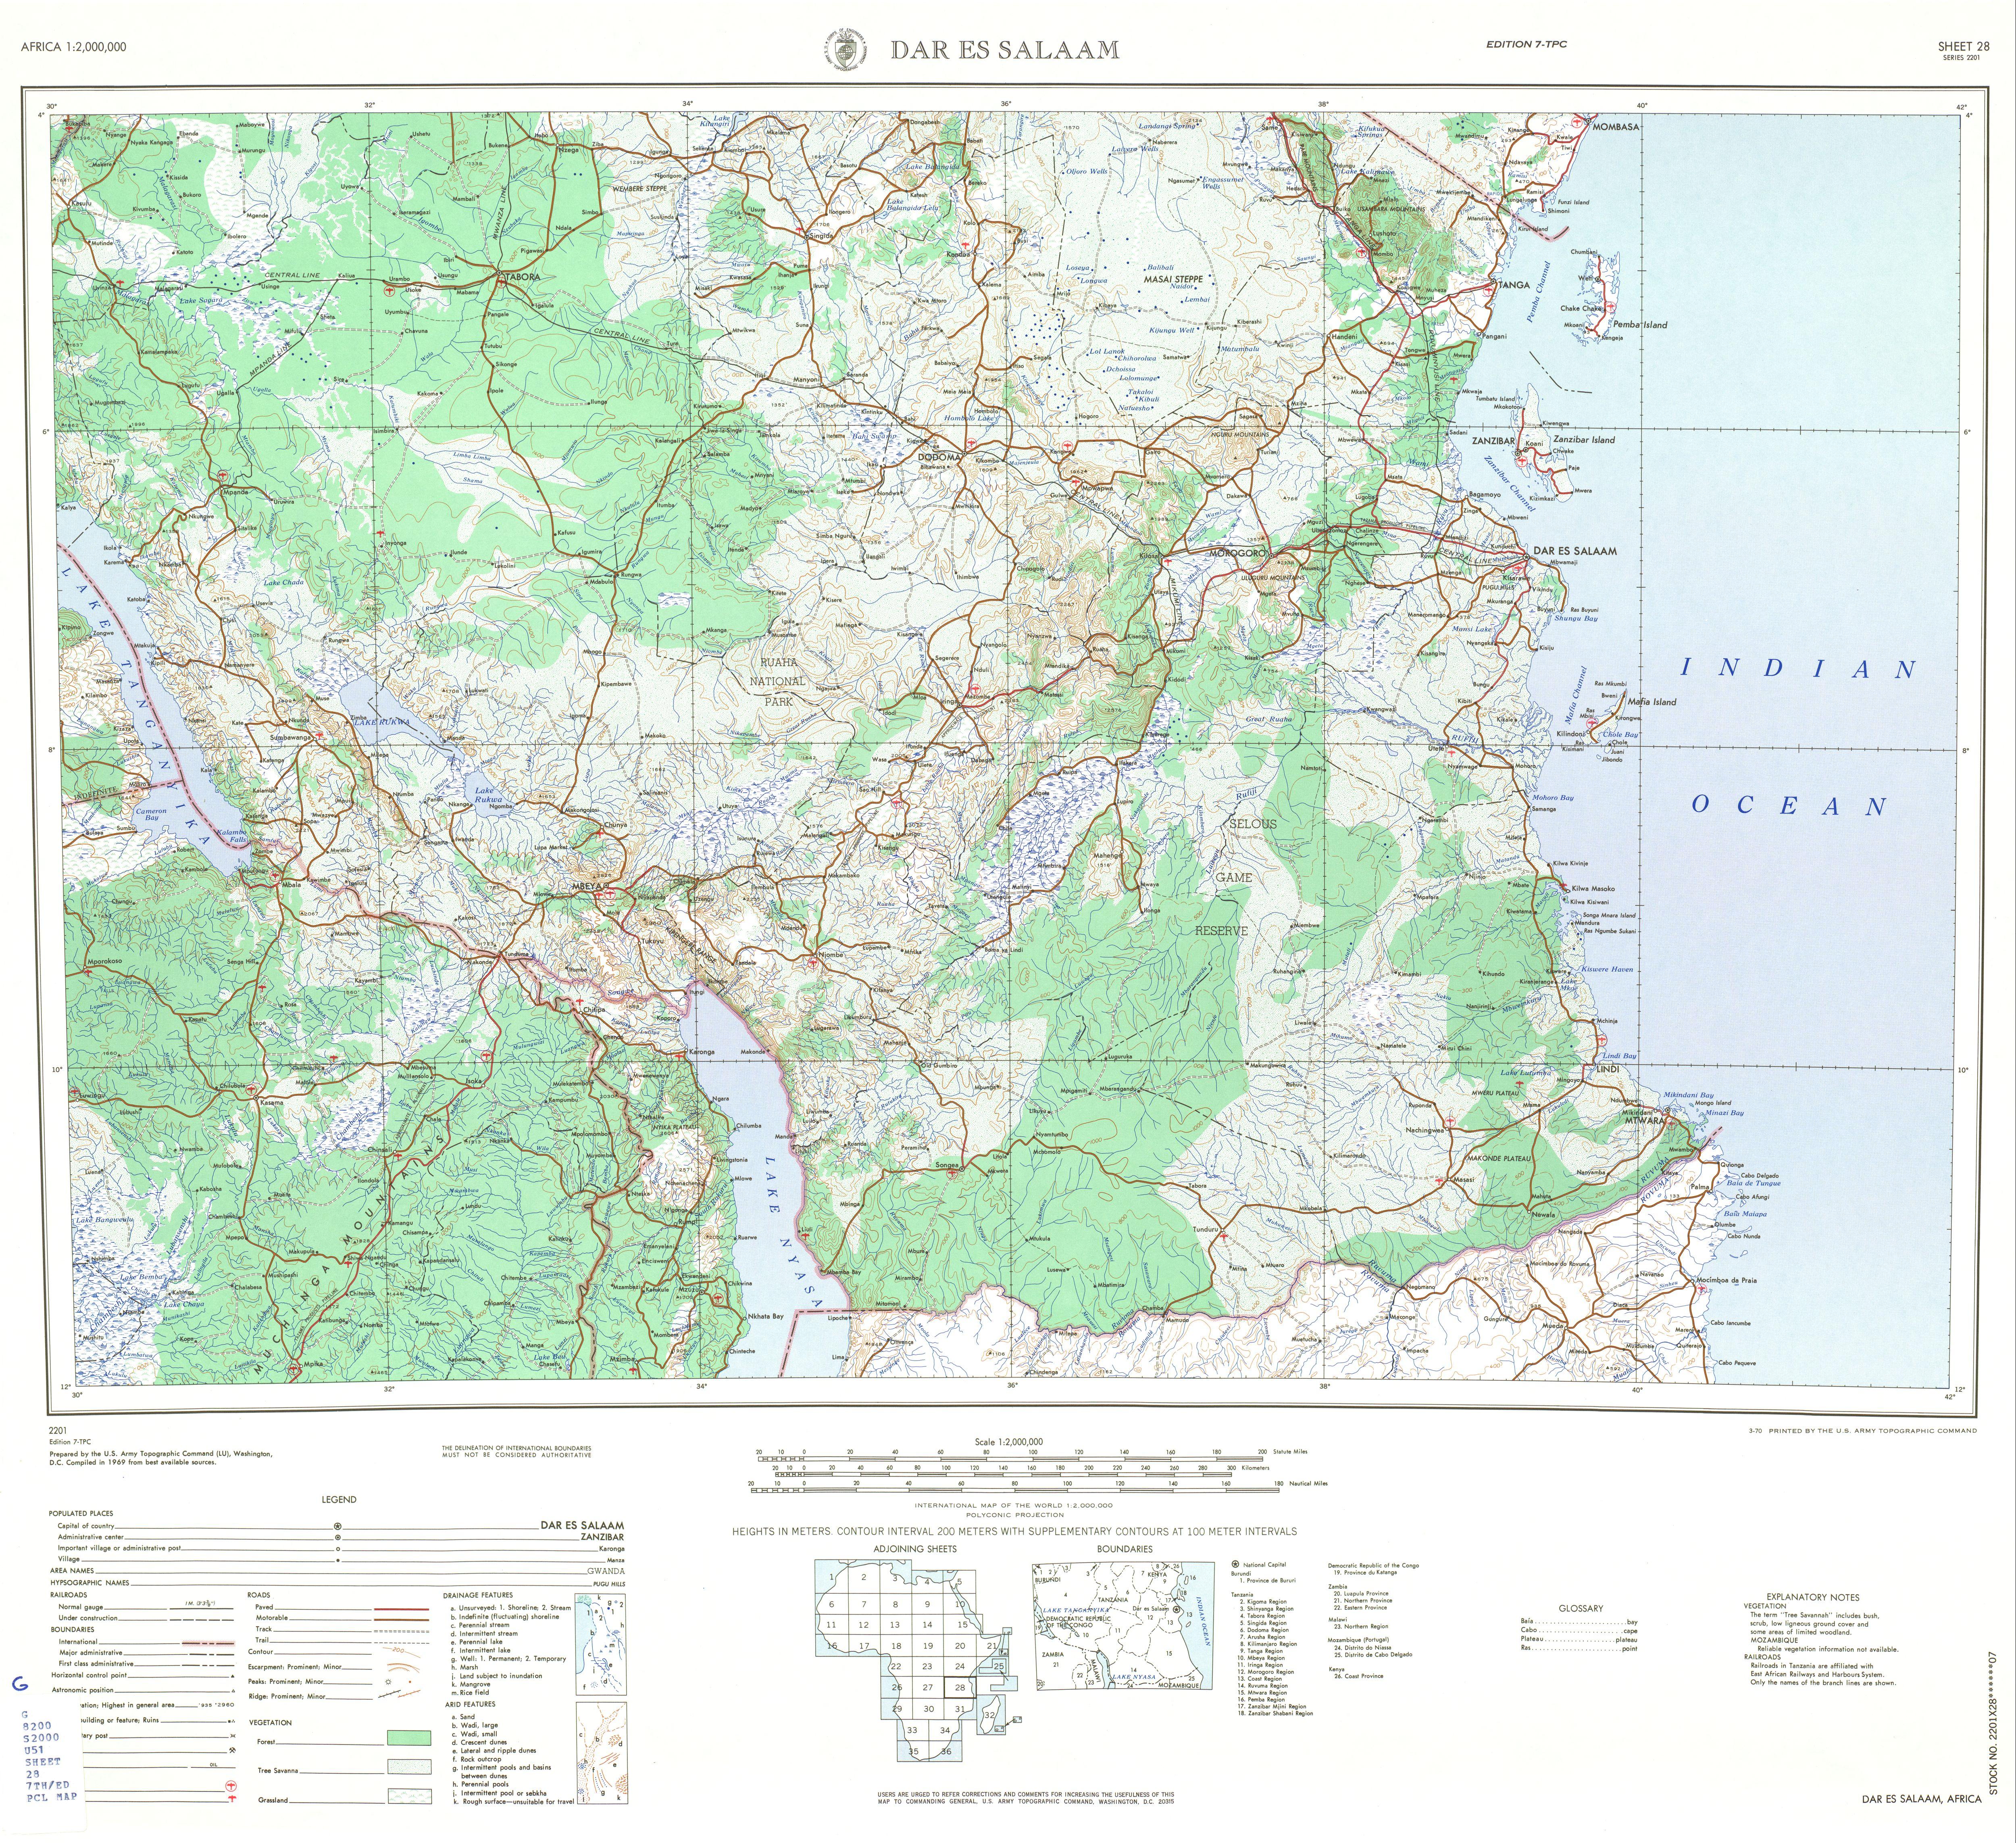 Dar es Salaam Topographic Sheet Map, Africa 1969